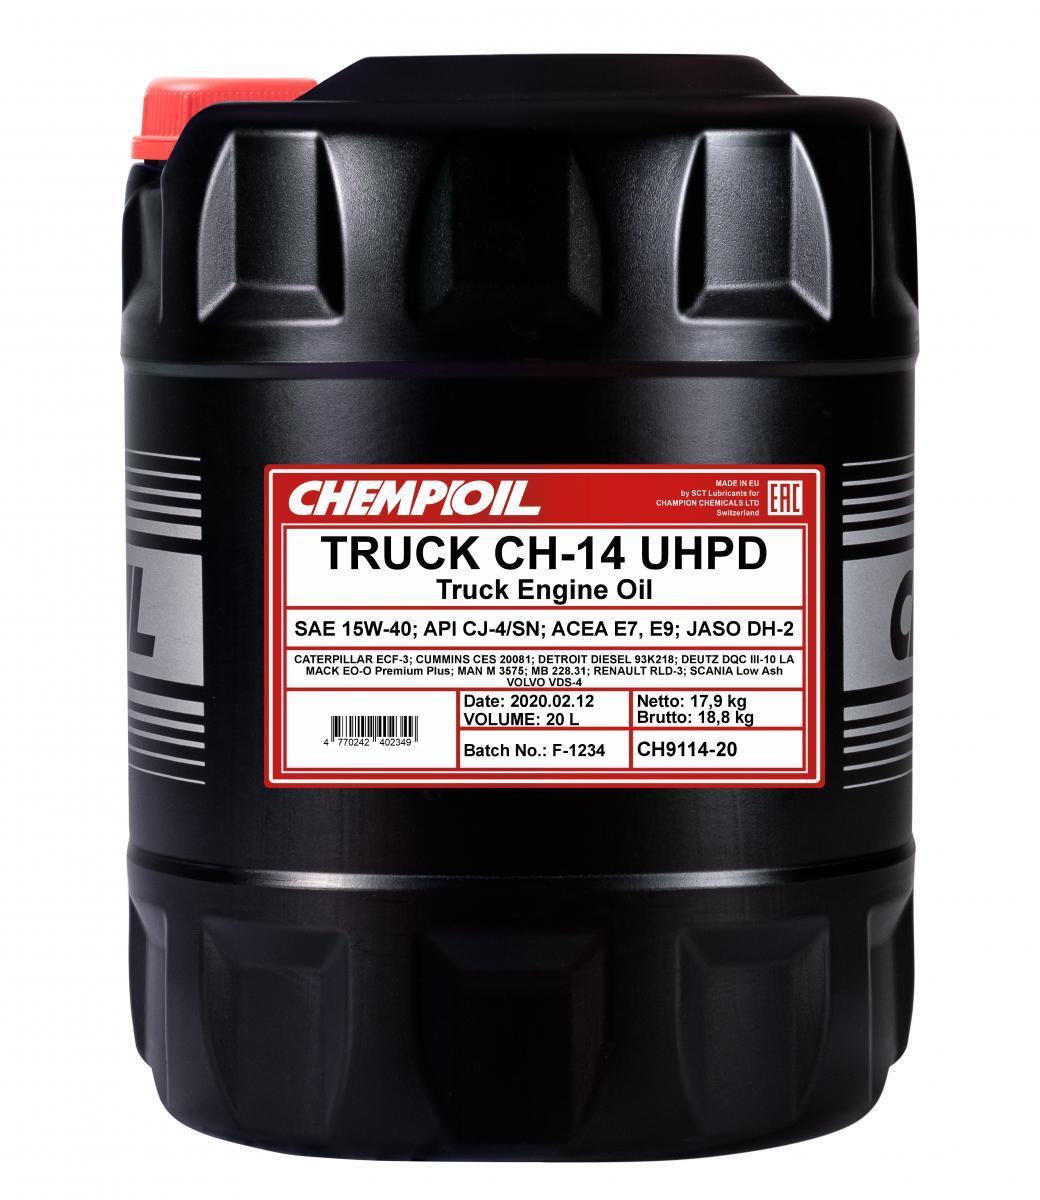 CHEMPIOIL TRUCK, CH-14 UHPD CH9114-20 Motoröl